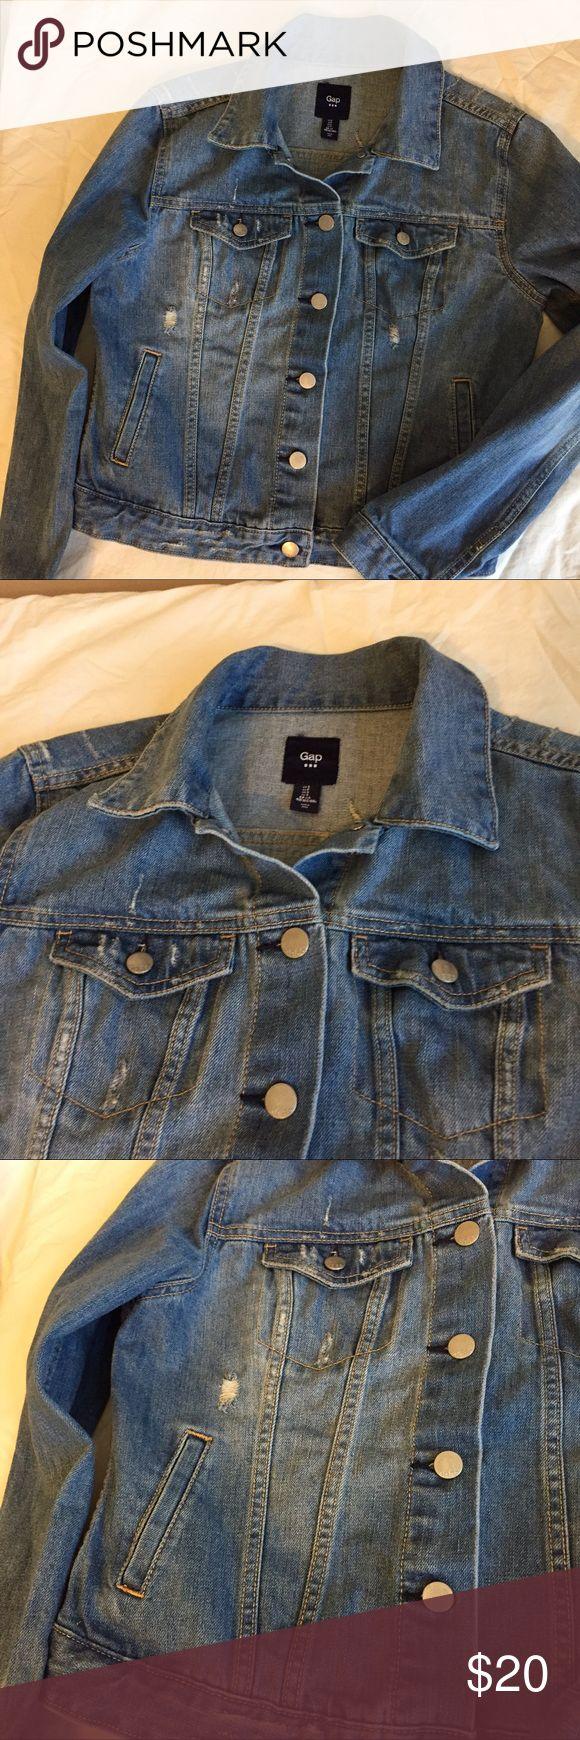 Gap factory 1969 distress denim jean jacket sz s